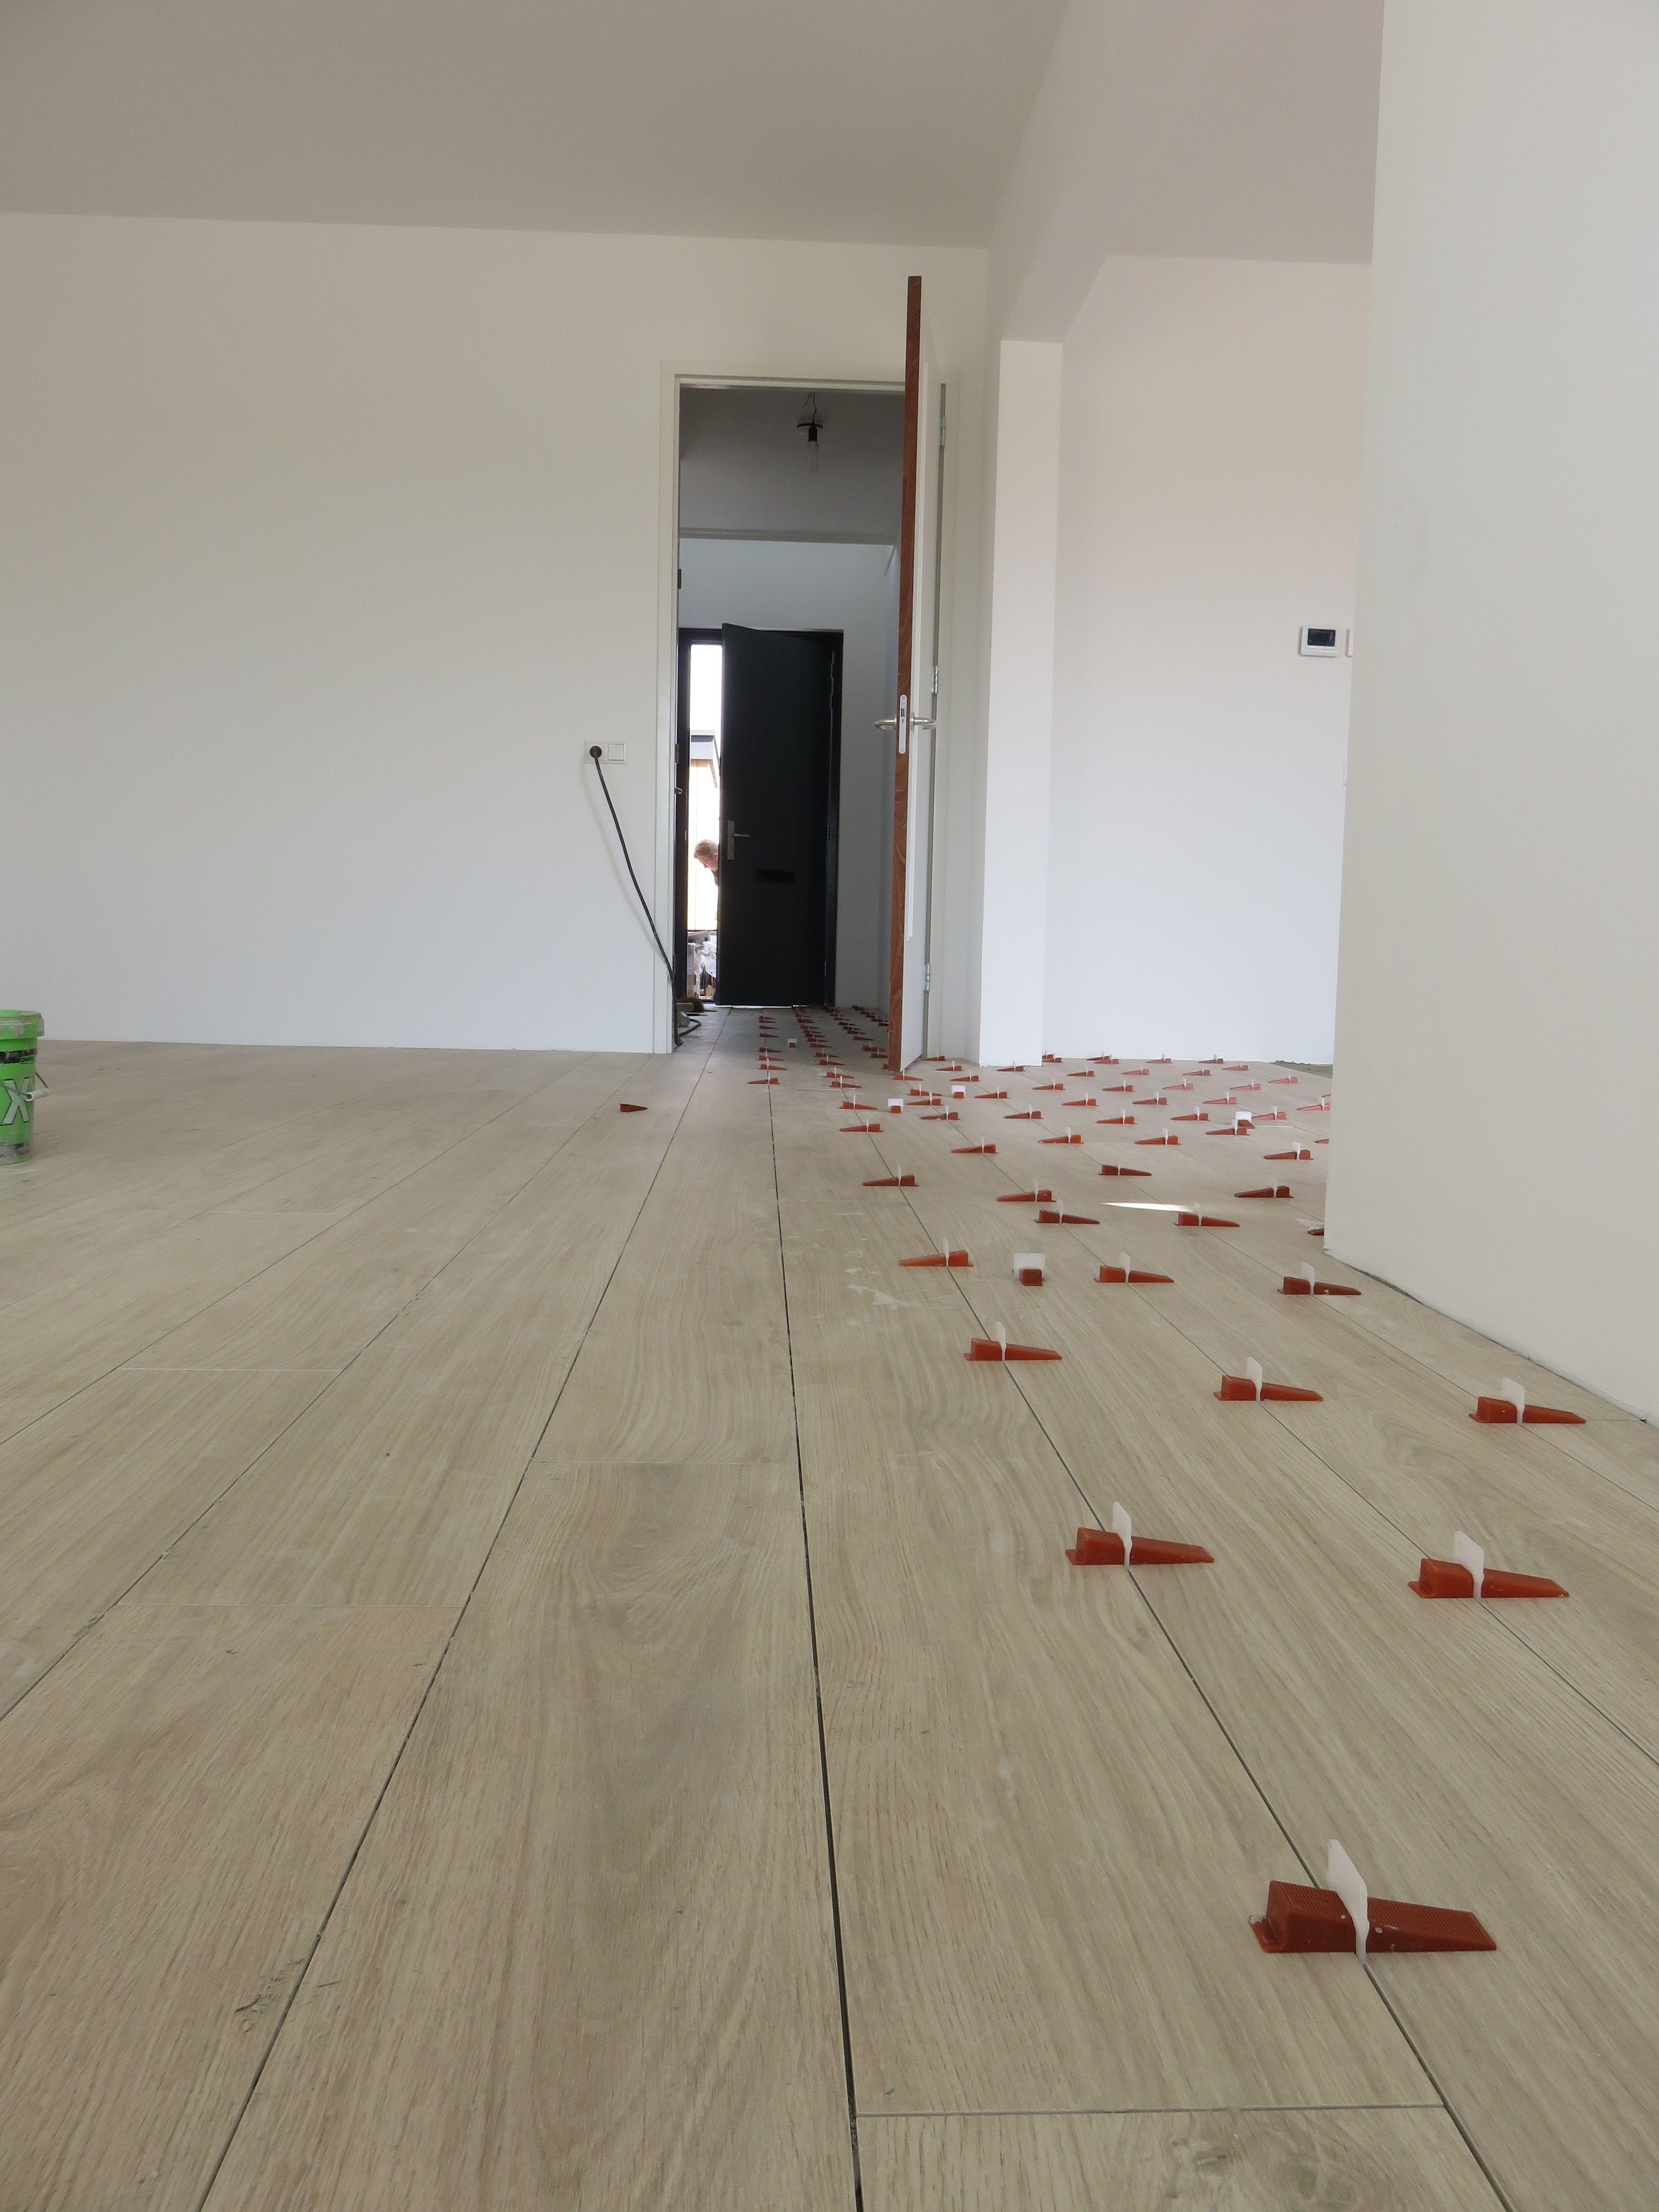 Houtlook tegels Lea slimtech woodstock cream wood 20x200 cm dunne ...